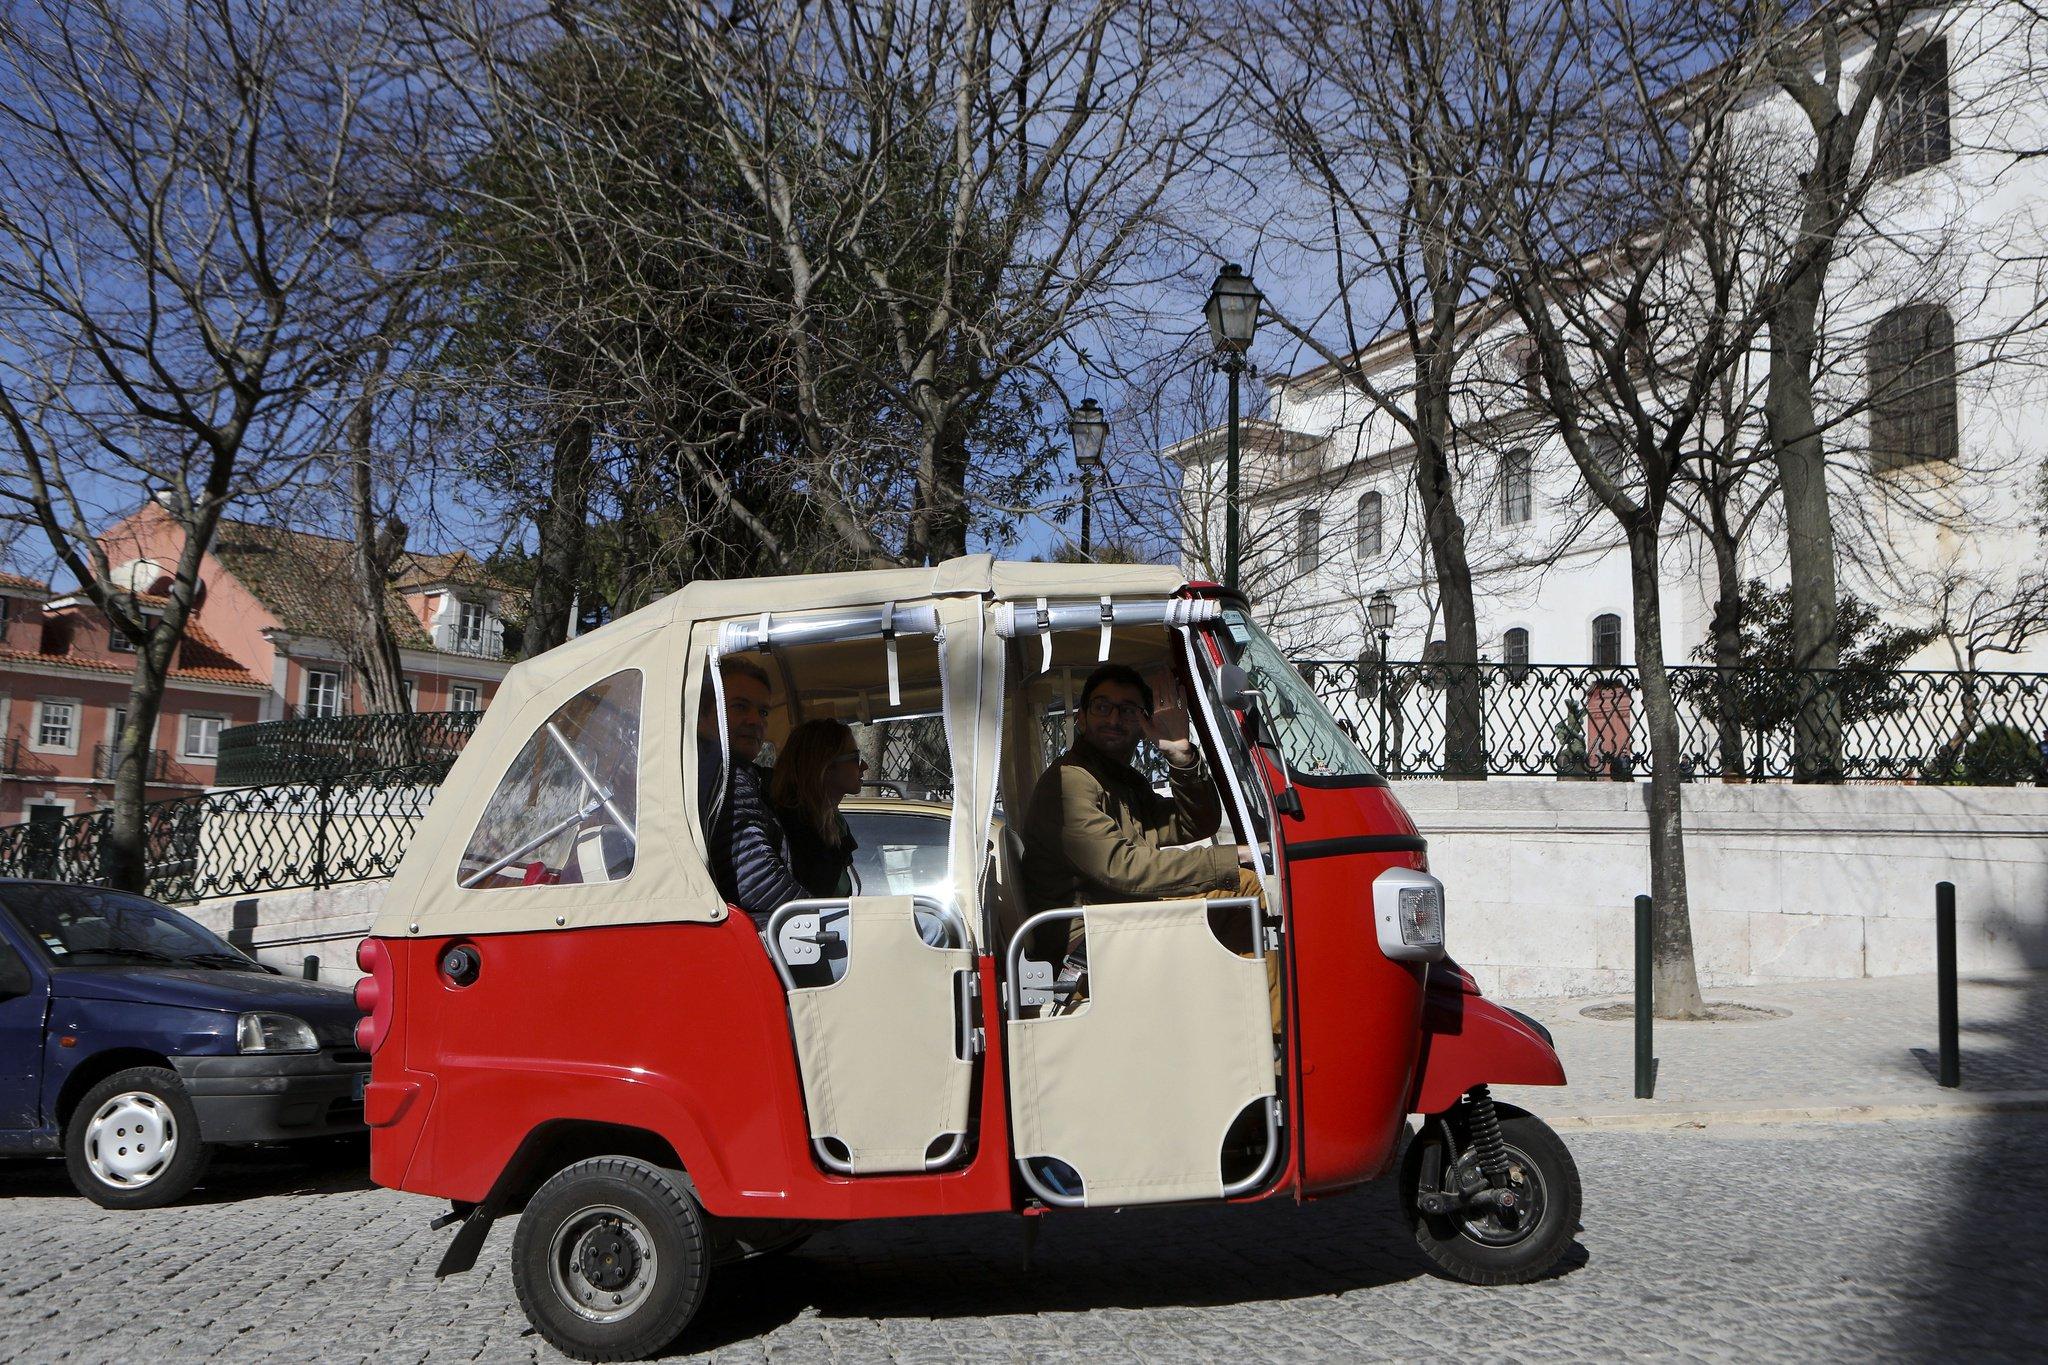 prince_julio_cesar_miss_tierra_replay_uber_2C_taxis_e_tuk_tuk_vao_estar_na_mira_da_gnr.jpg